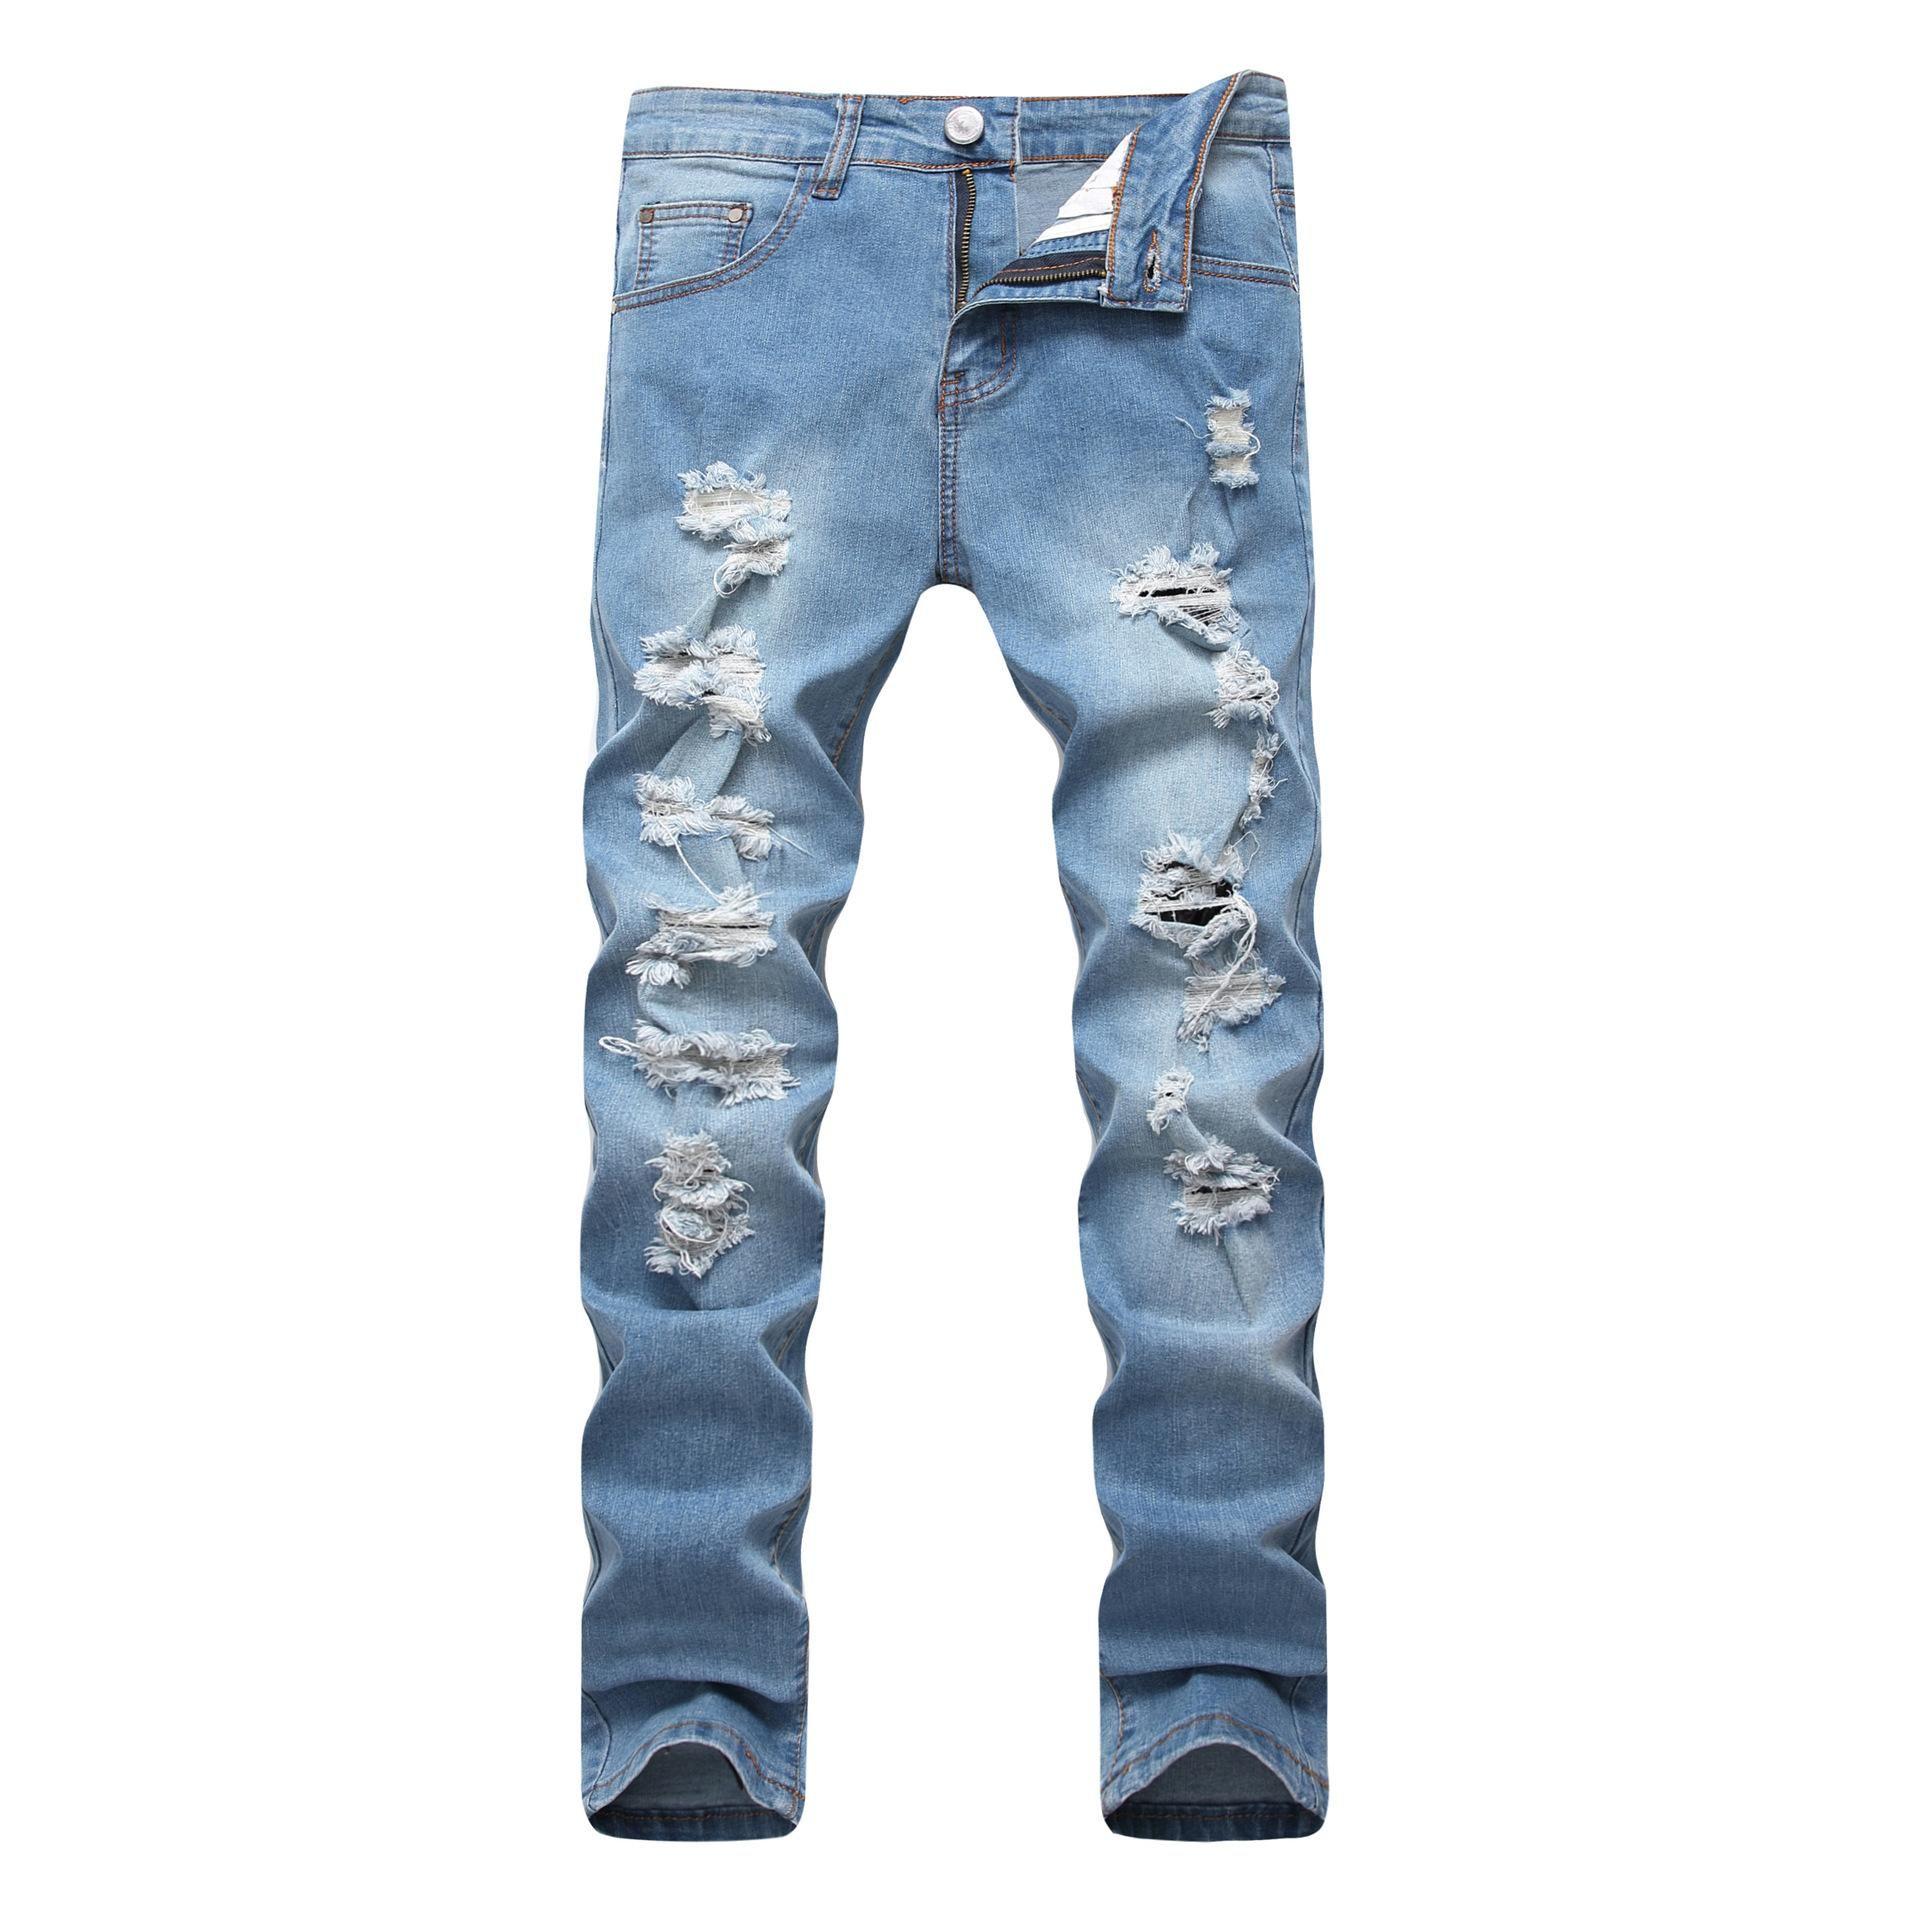 0b40ab364a3 2019 2018 Men Hole Jeans Represent Clothing Designer Pants Slp Blue  Destroyed Mens Slim Denim Straight Biker Skinny Jeans Men Ripped Jeans 28  42 From ...